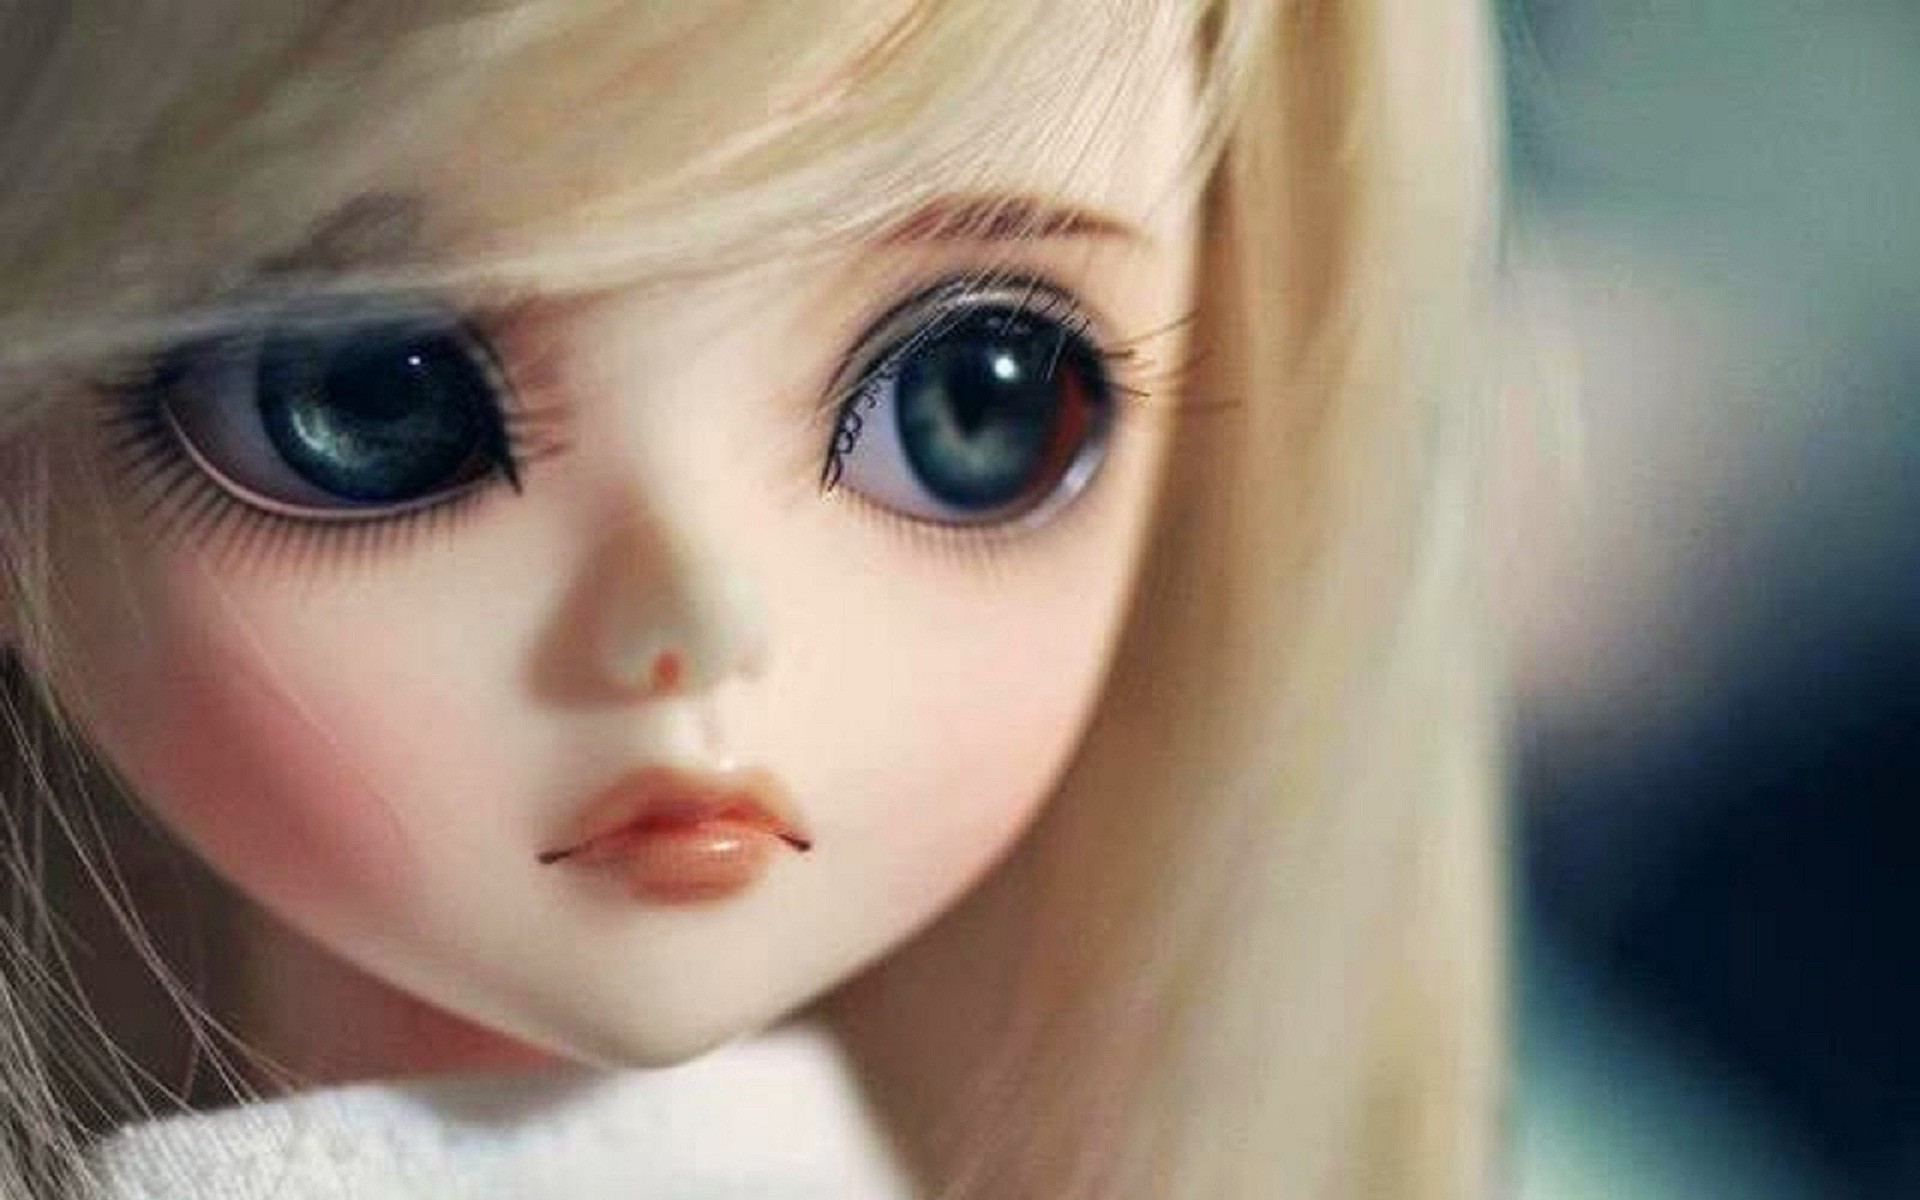 Beautiful Girl Face Hd Desktop Wallpaper Pretty Faces Wallpapers 183 ① Wallpapertag